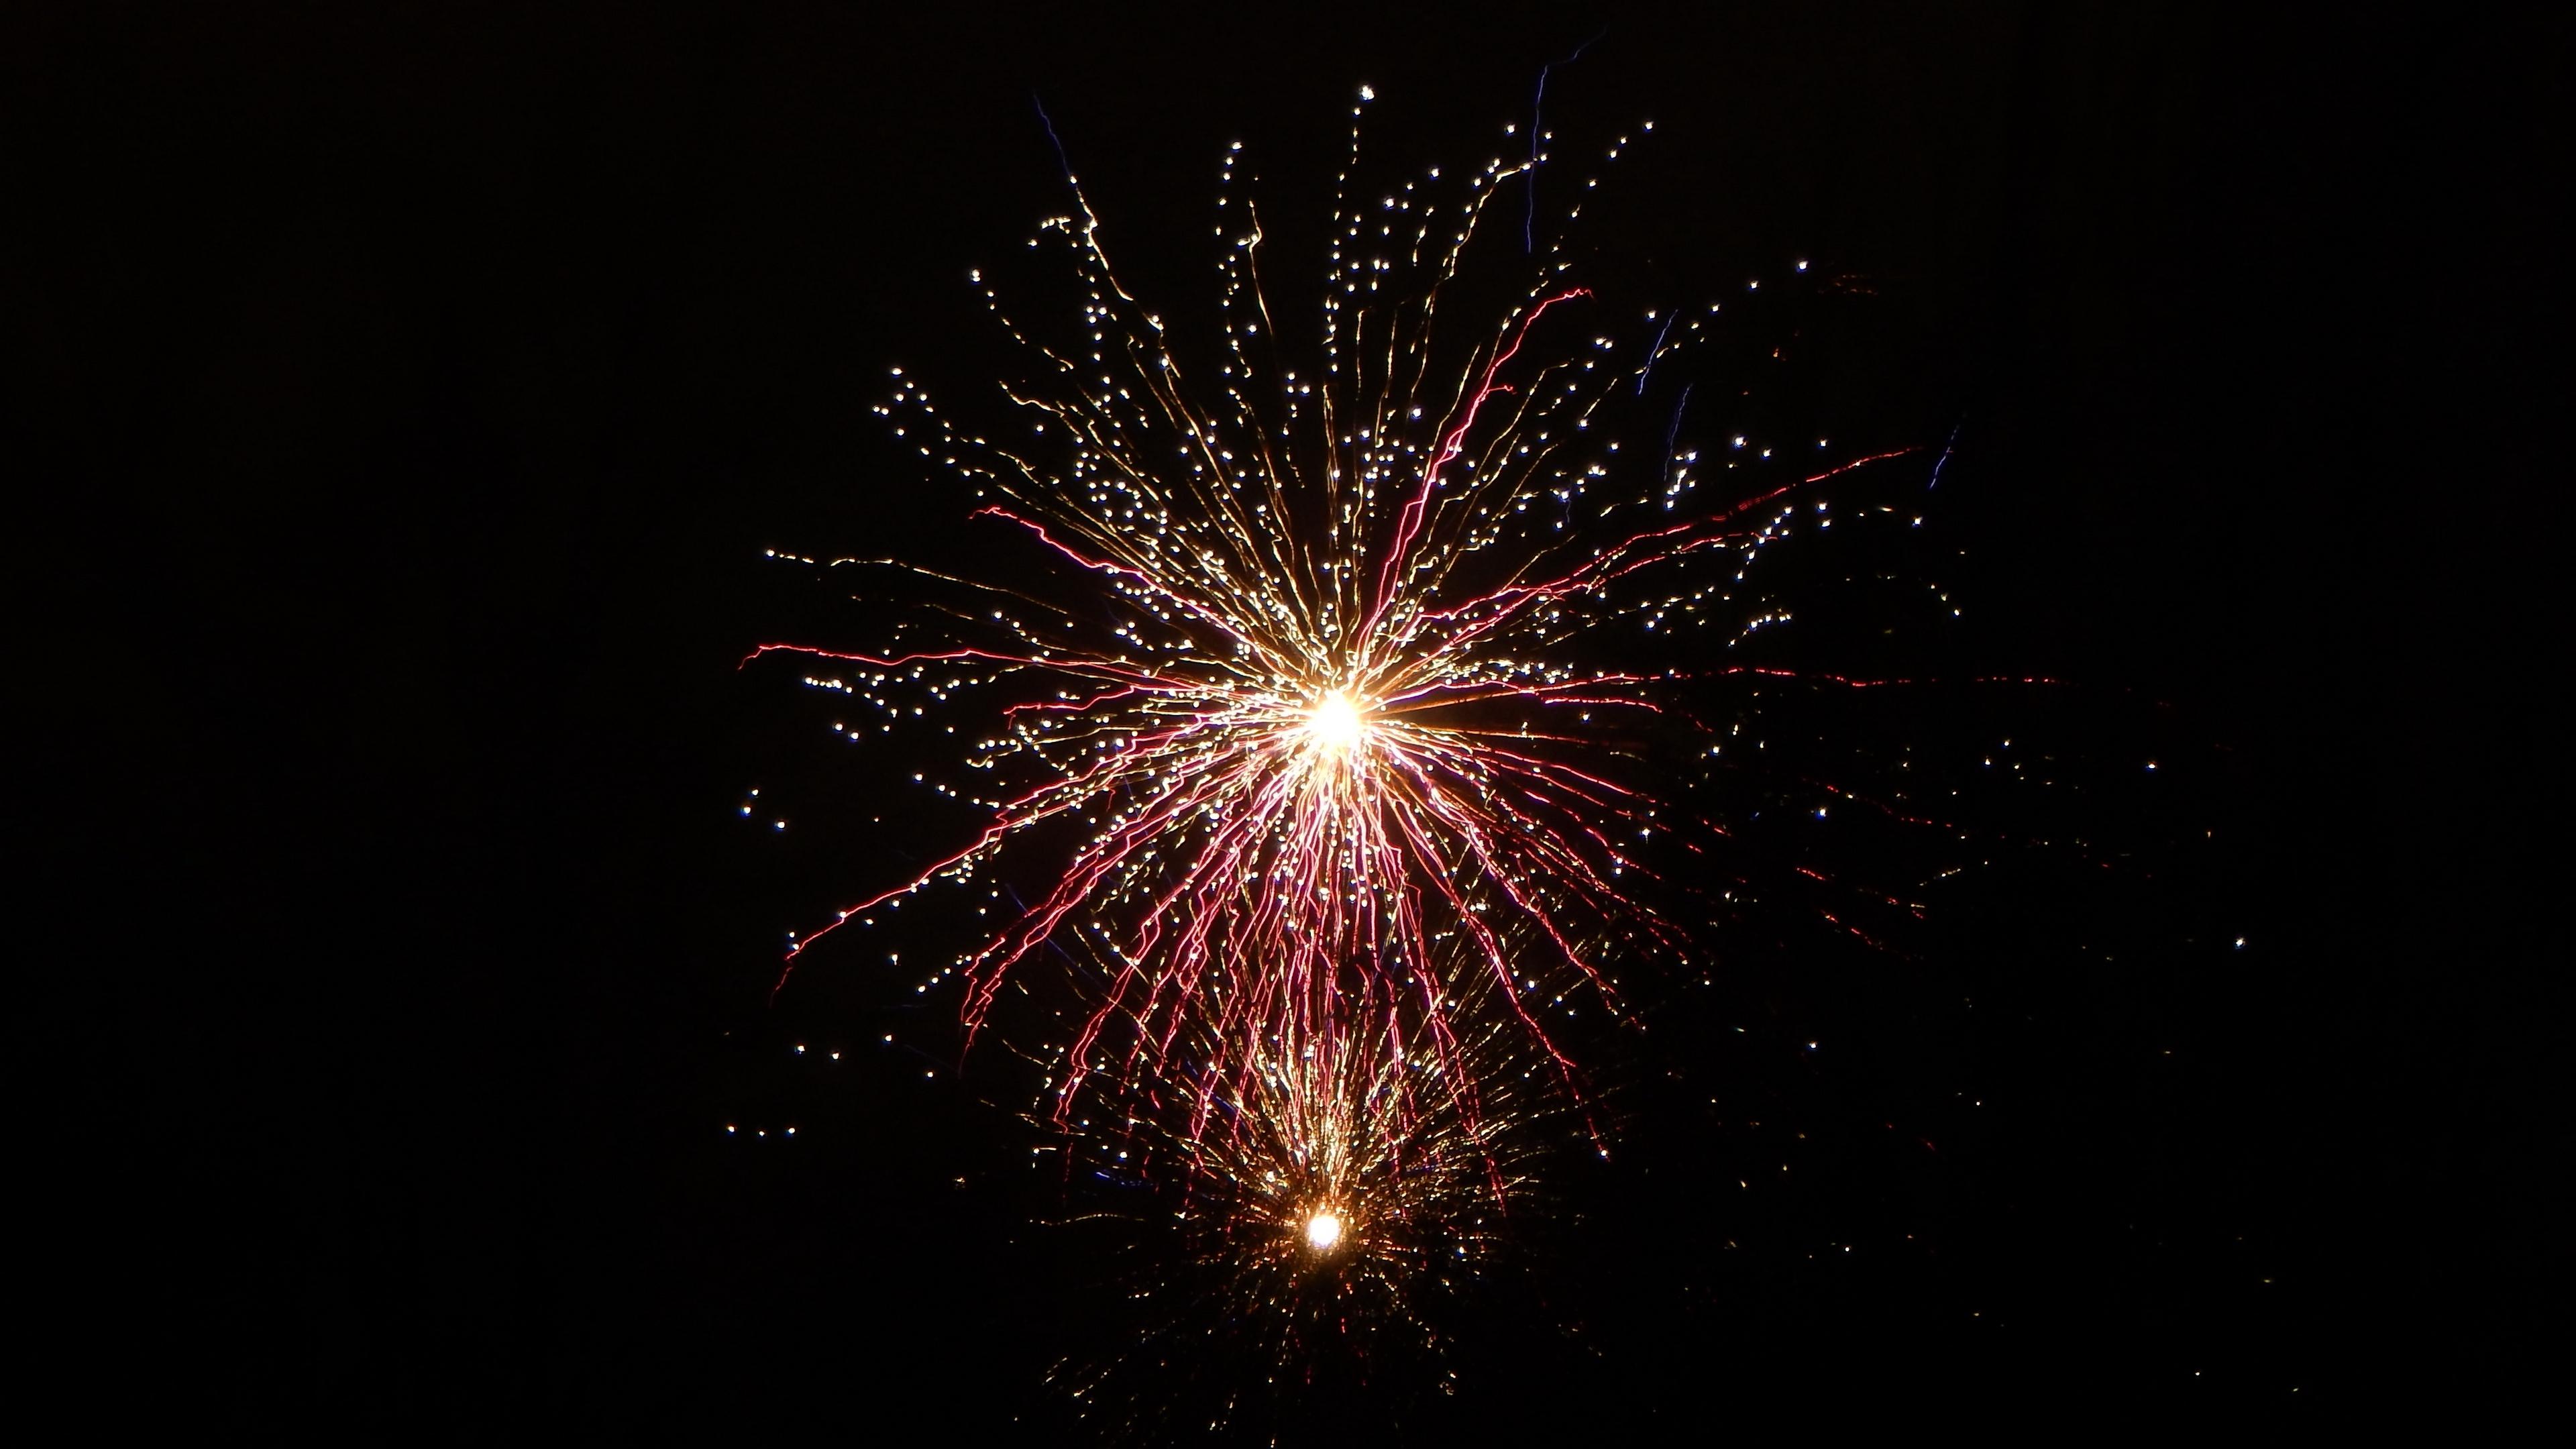 salute fireworks sky glitter 4k 1538344745 - salute, fireworks, sky, glitter 4k - Sky, salute, Fireworks